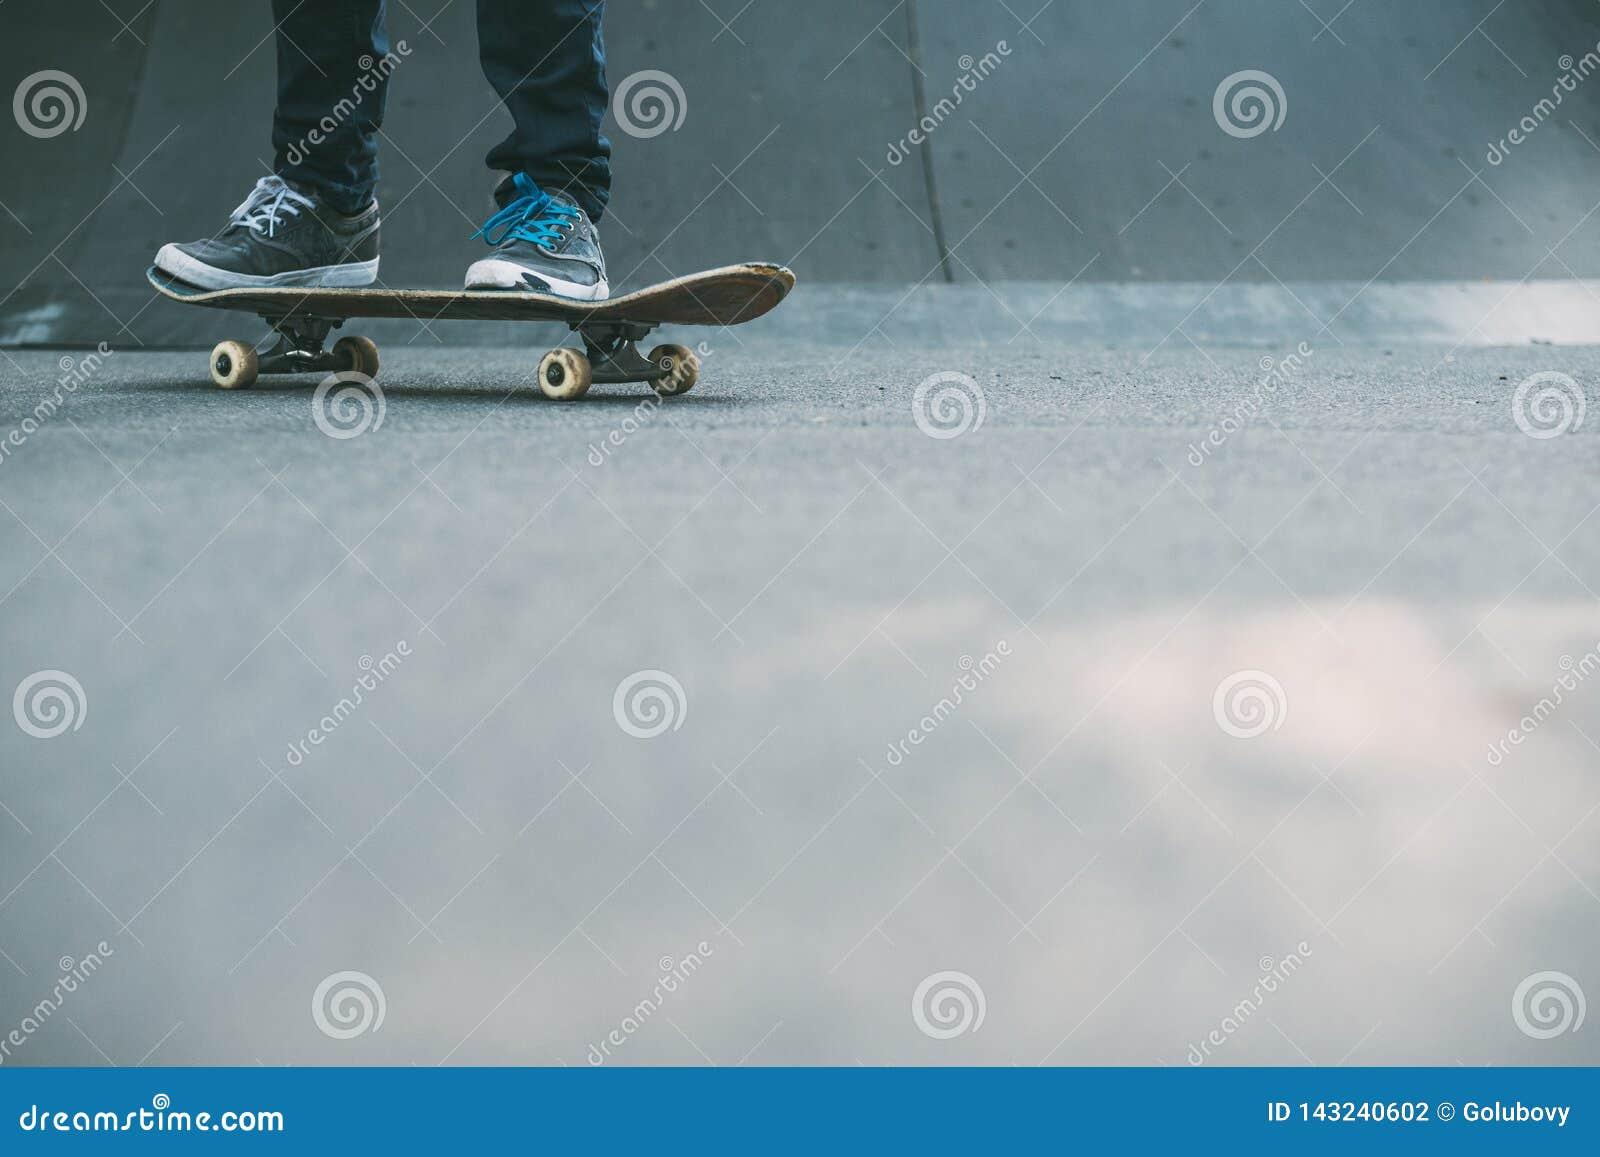 Man feet skateboard ramp urban hipster lifestyle